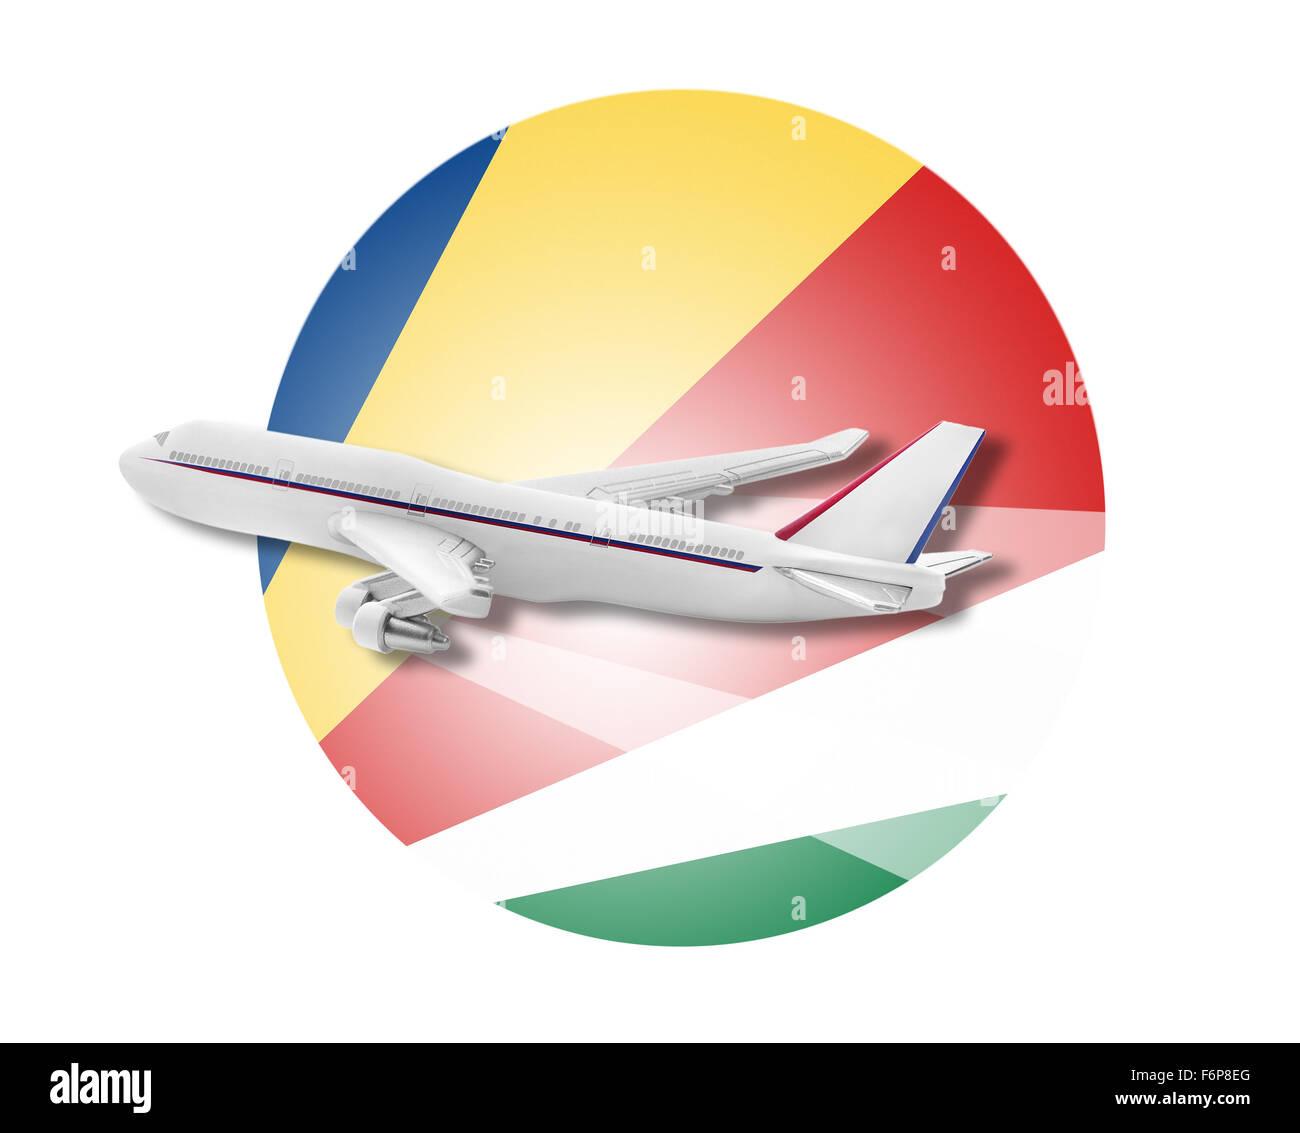 Plane and Seychelles flag. - Stock Image